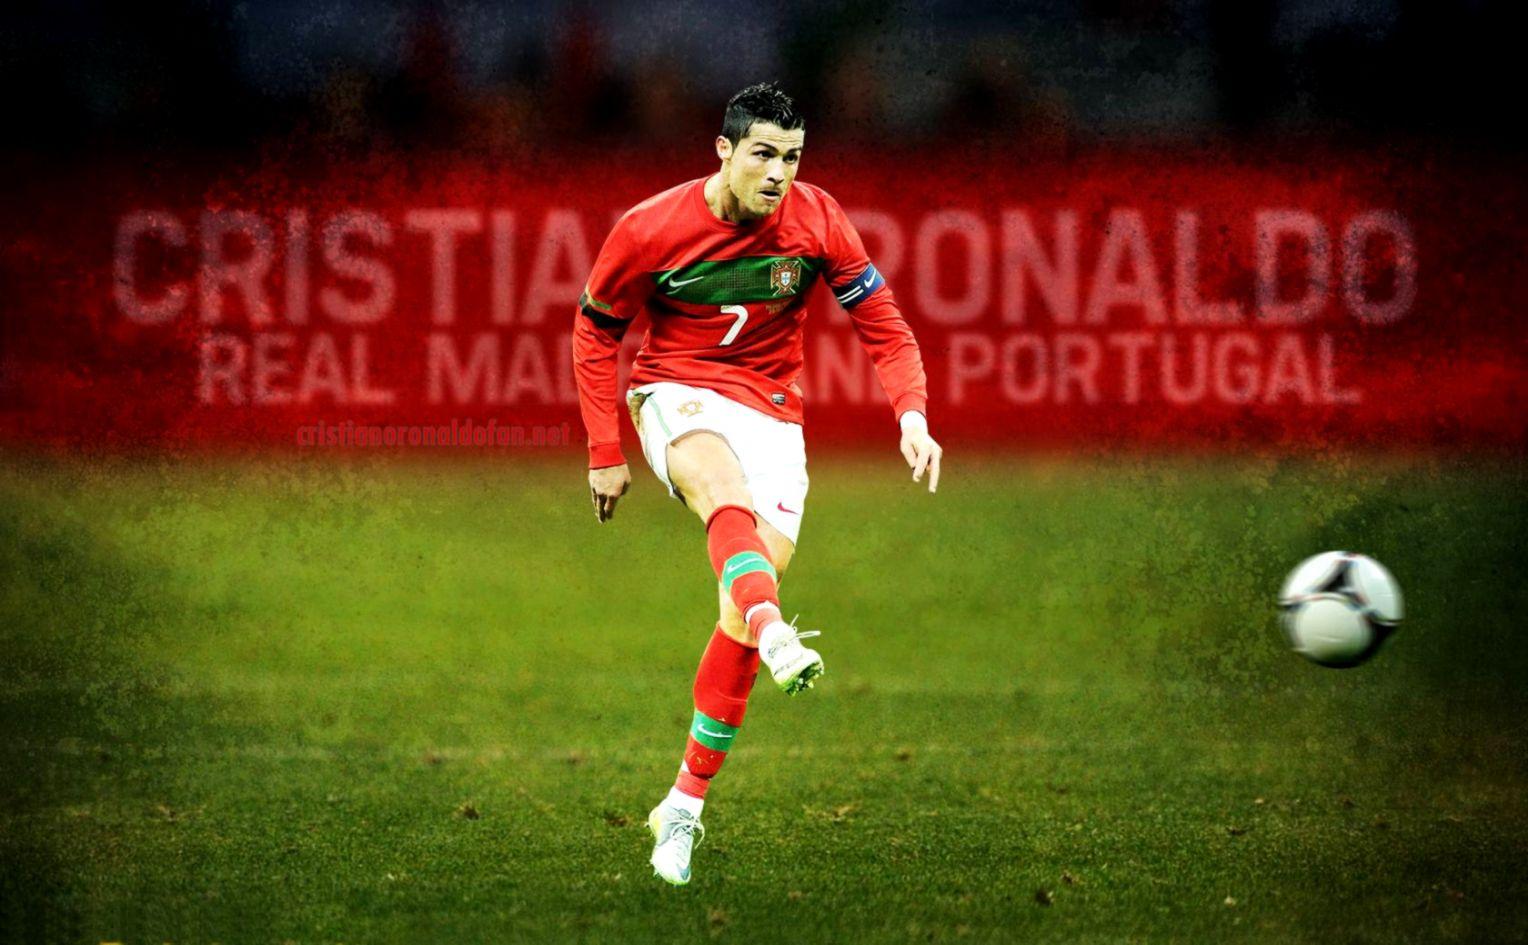 55ca9e748 Cristiano Ronaldo Cr7 Football Player Real Madrid Jersey King